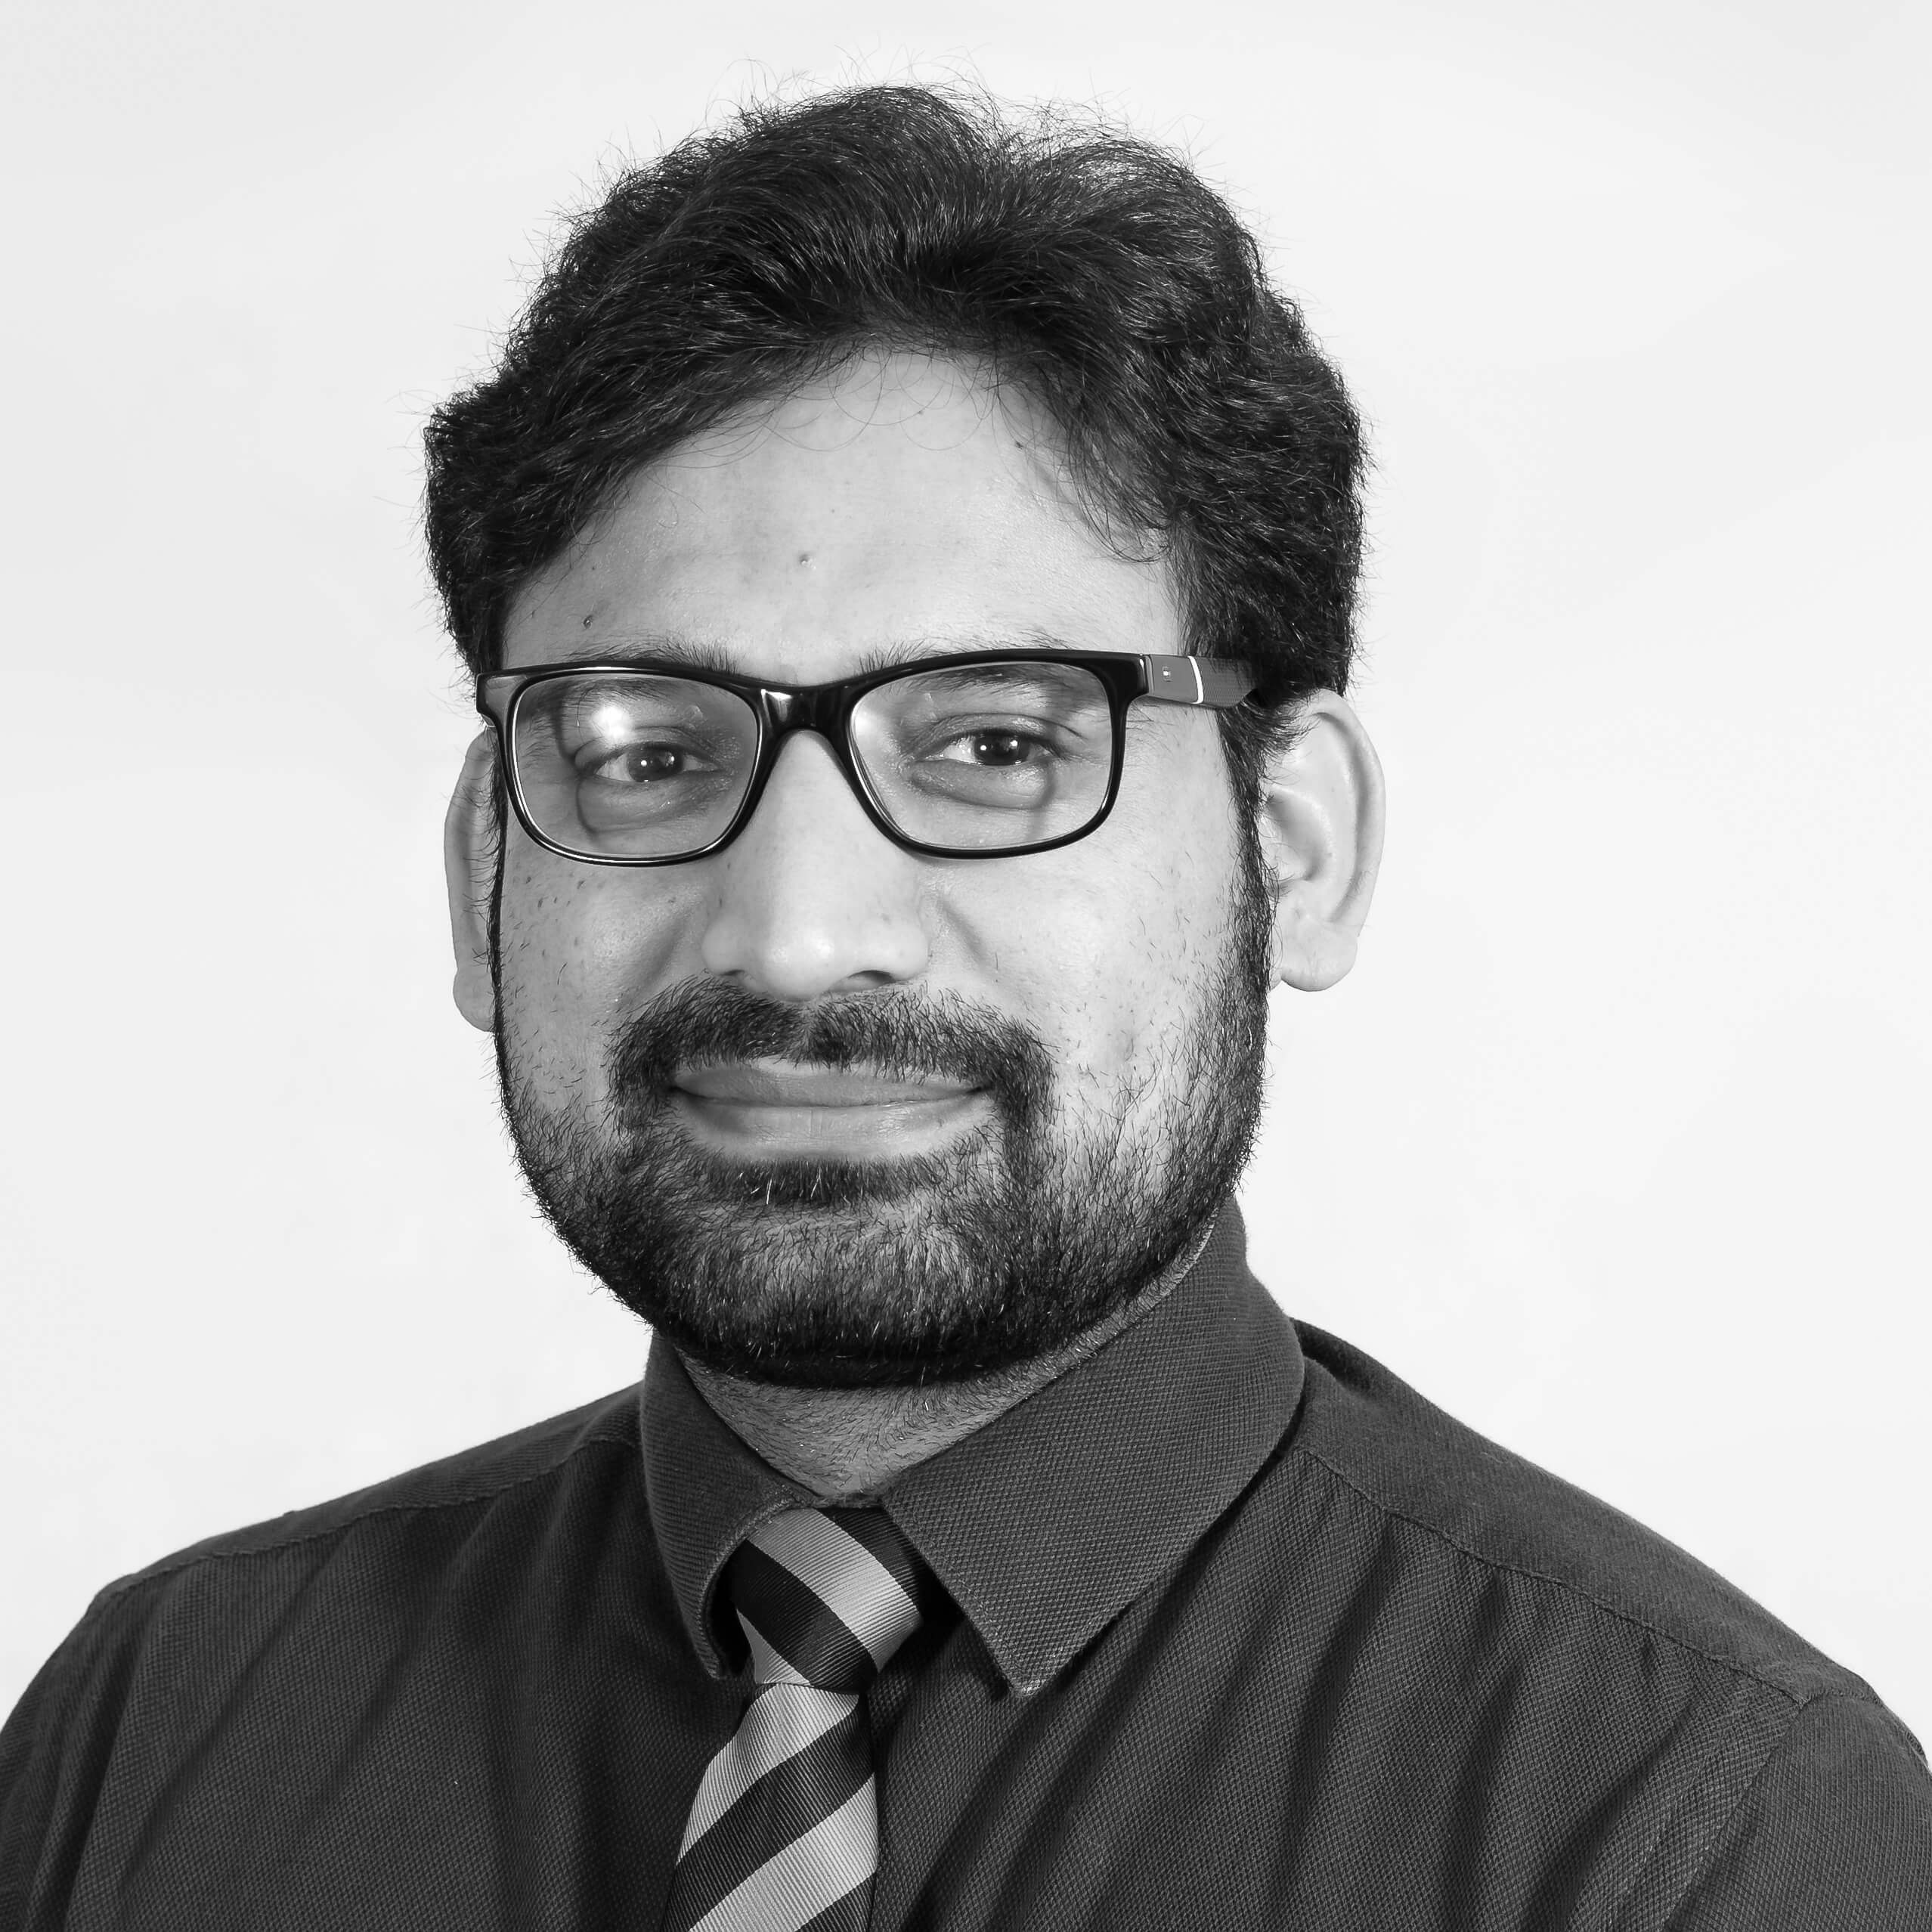 Asim Bhatti